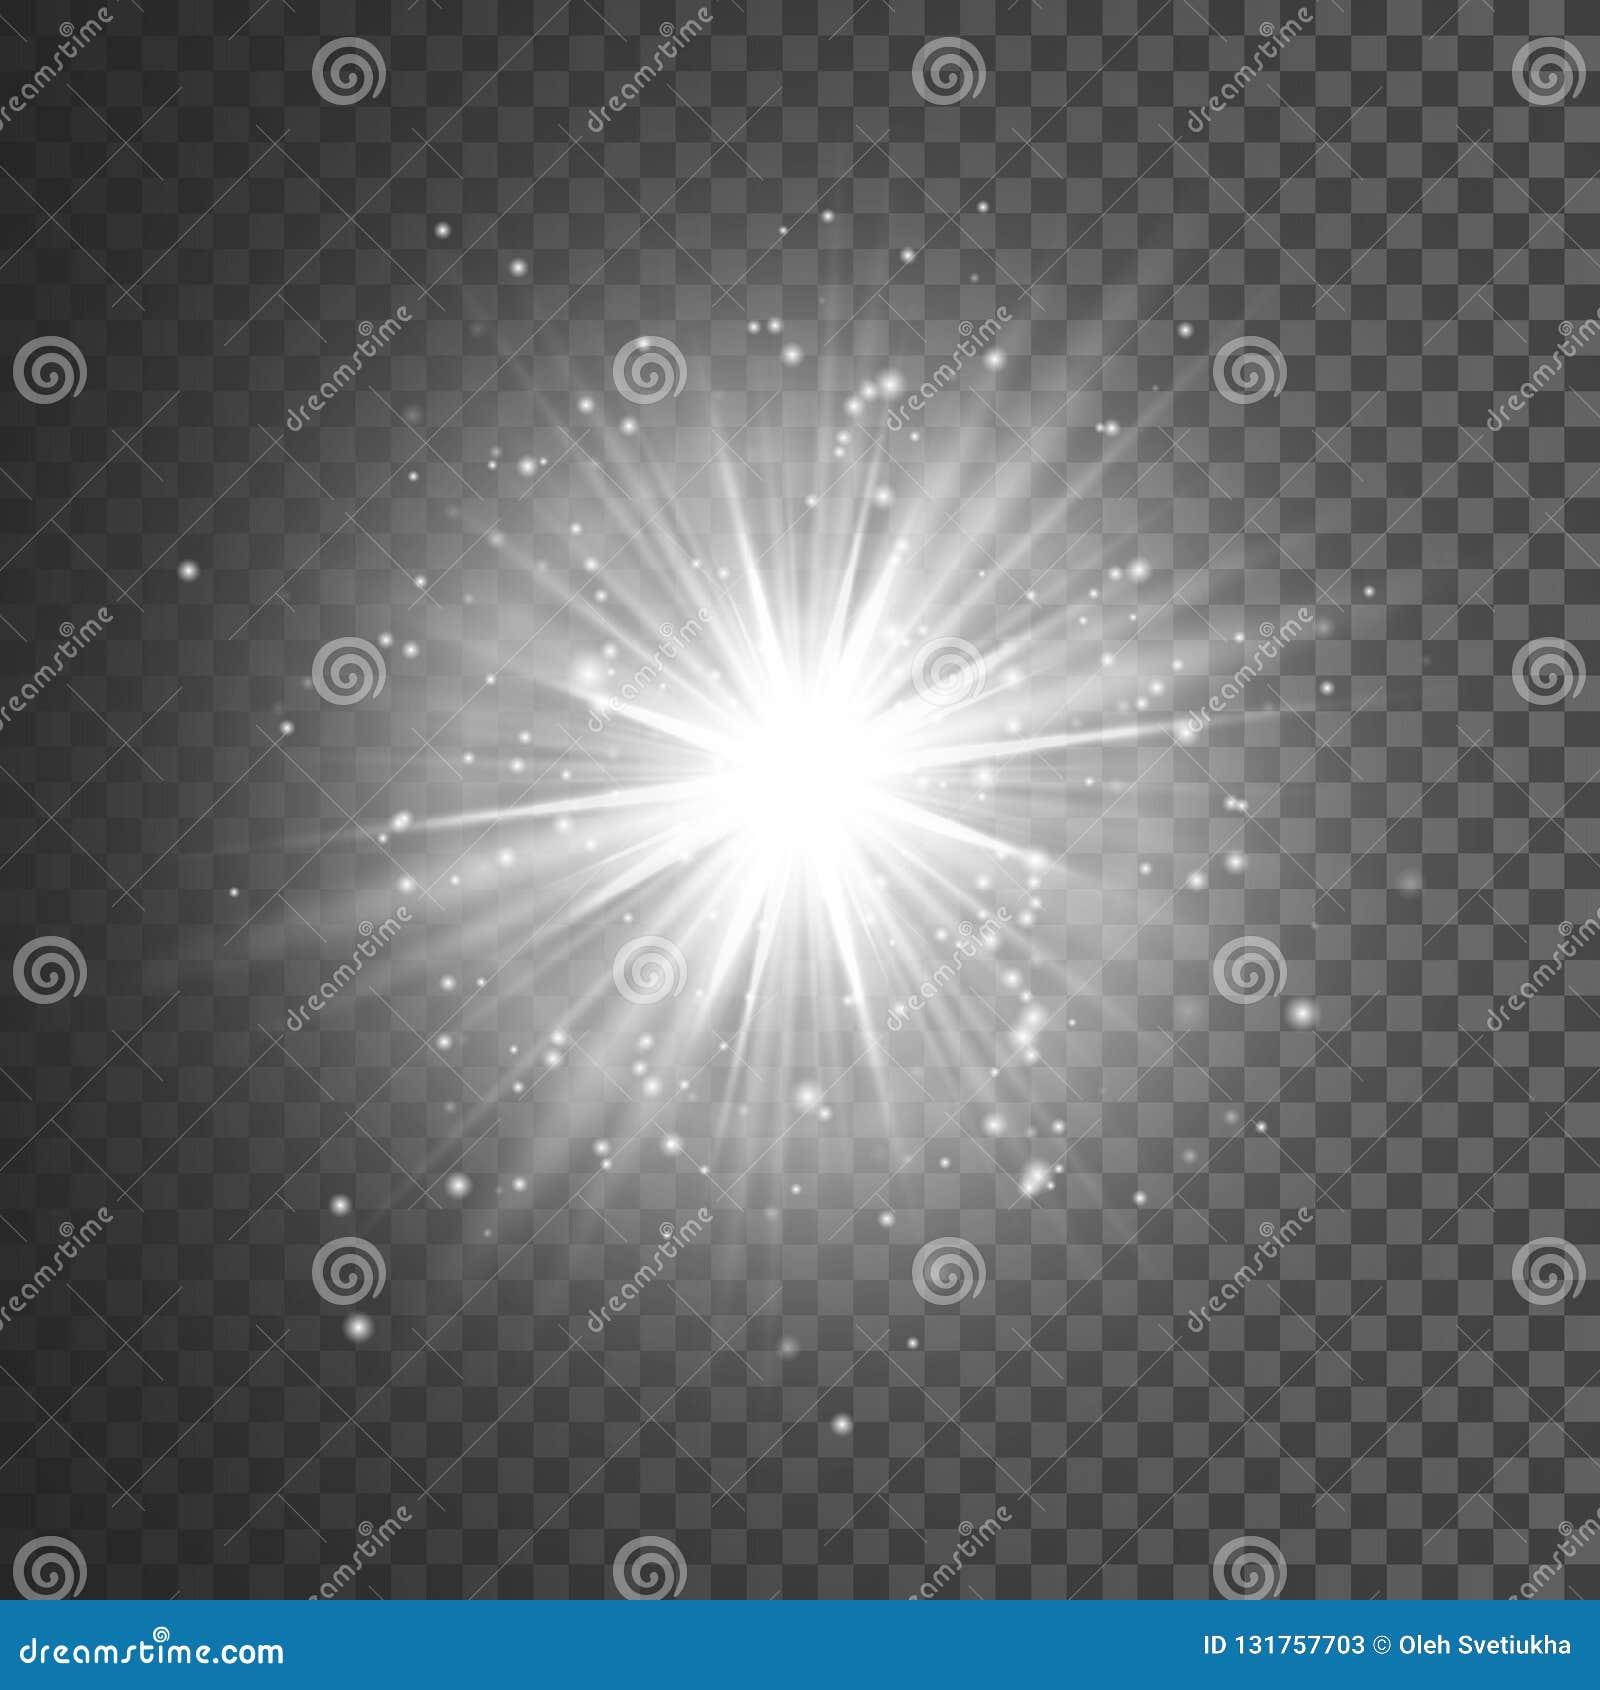 Transparent glow light effect. Star burst with sparkles. White glitter. Vector illustration